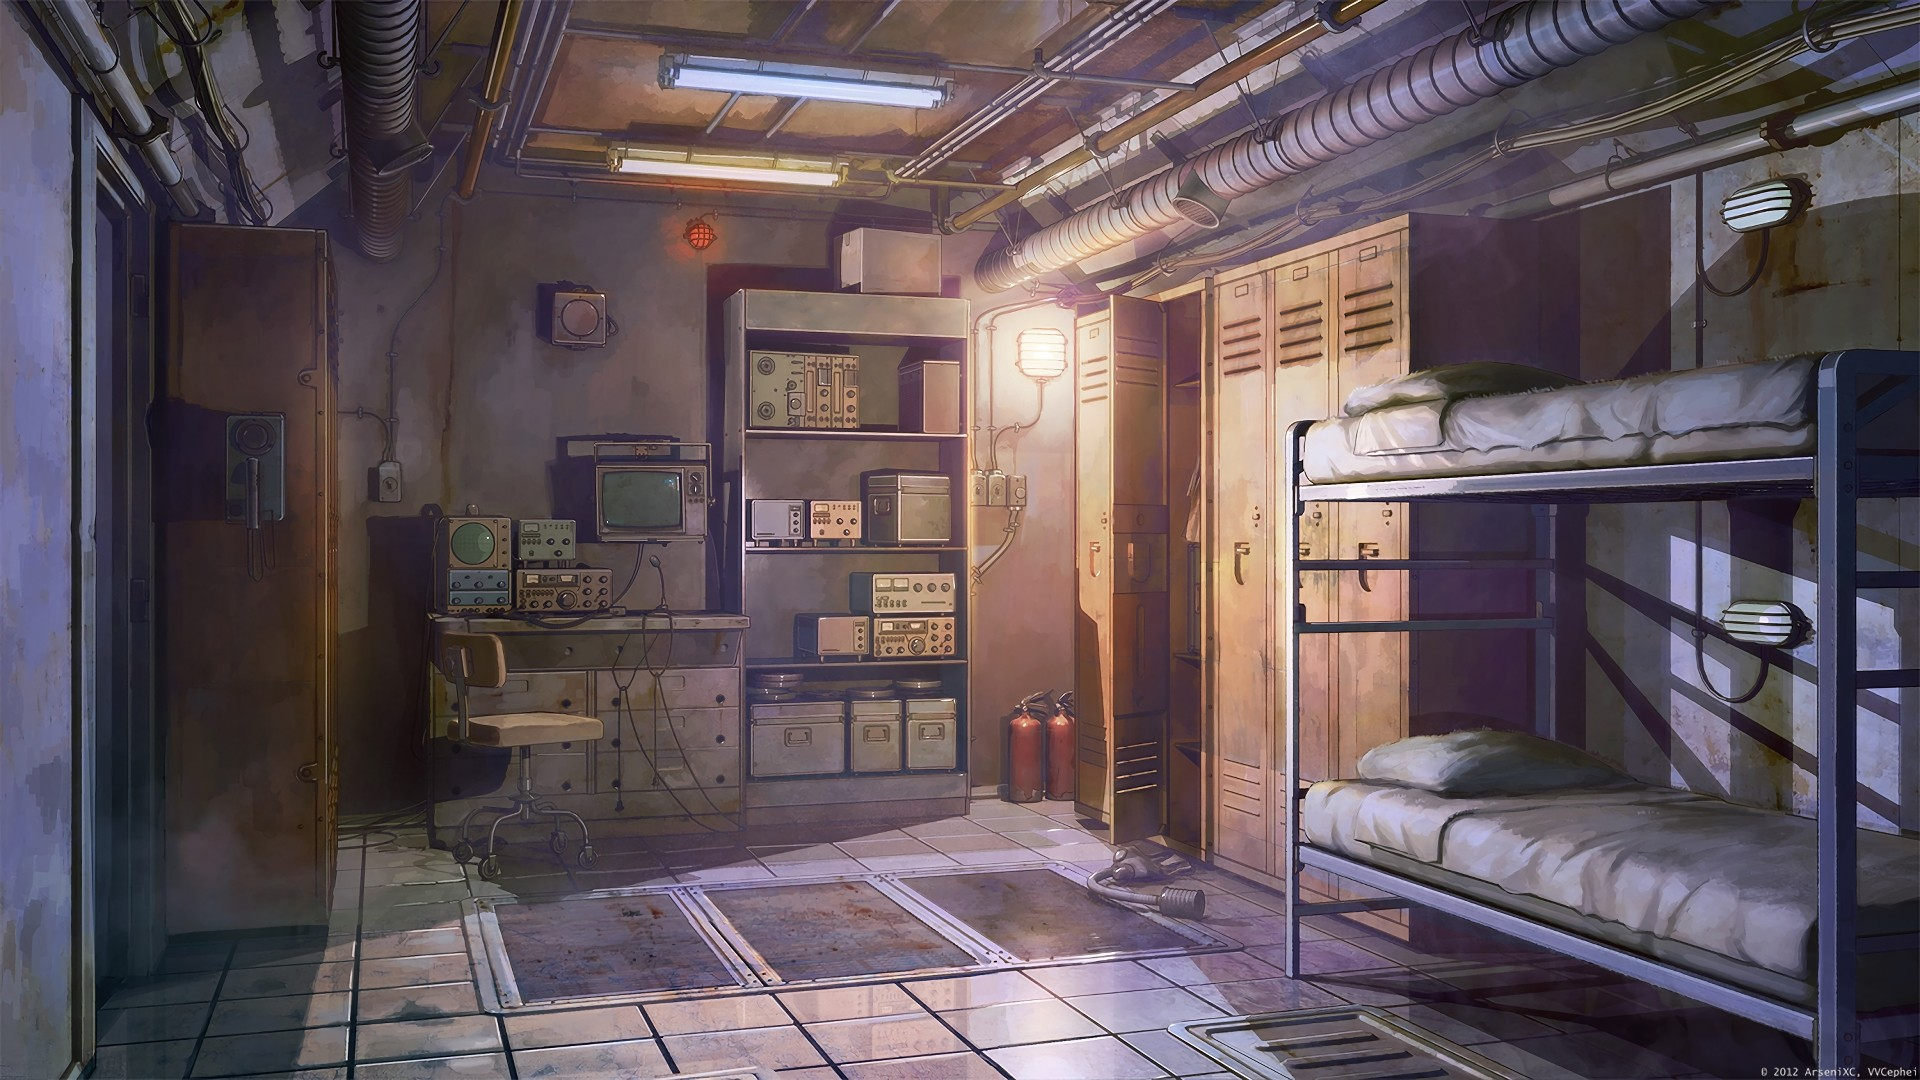 Anime Bedroom Wallpaper theme